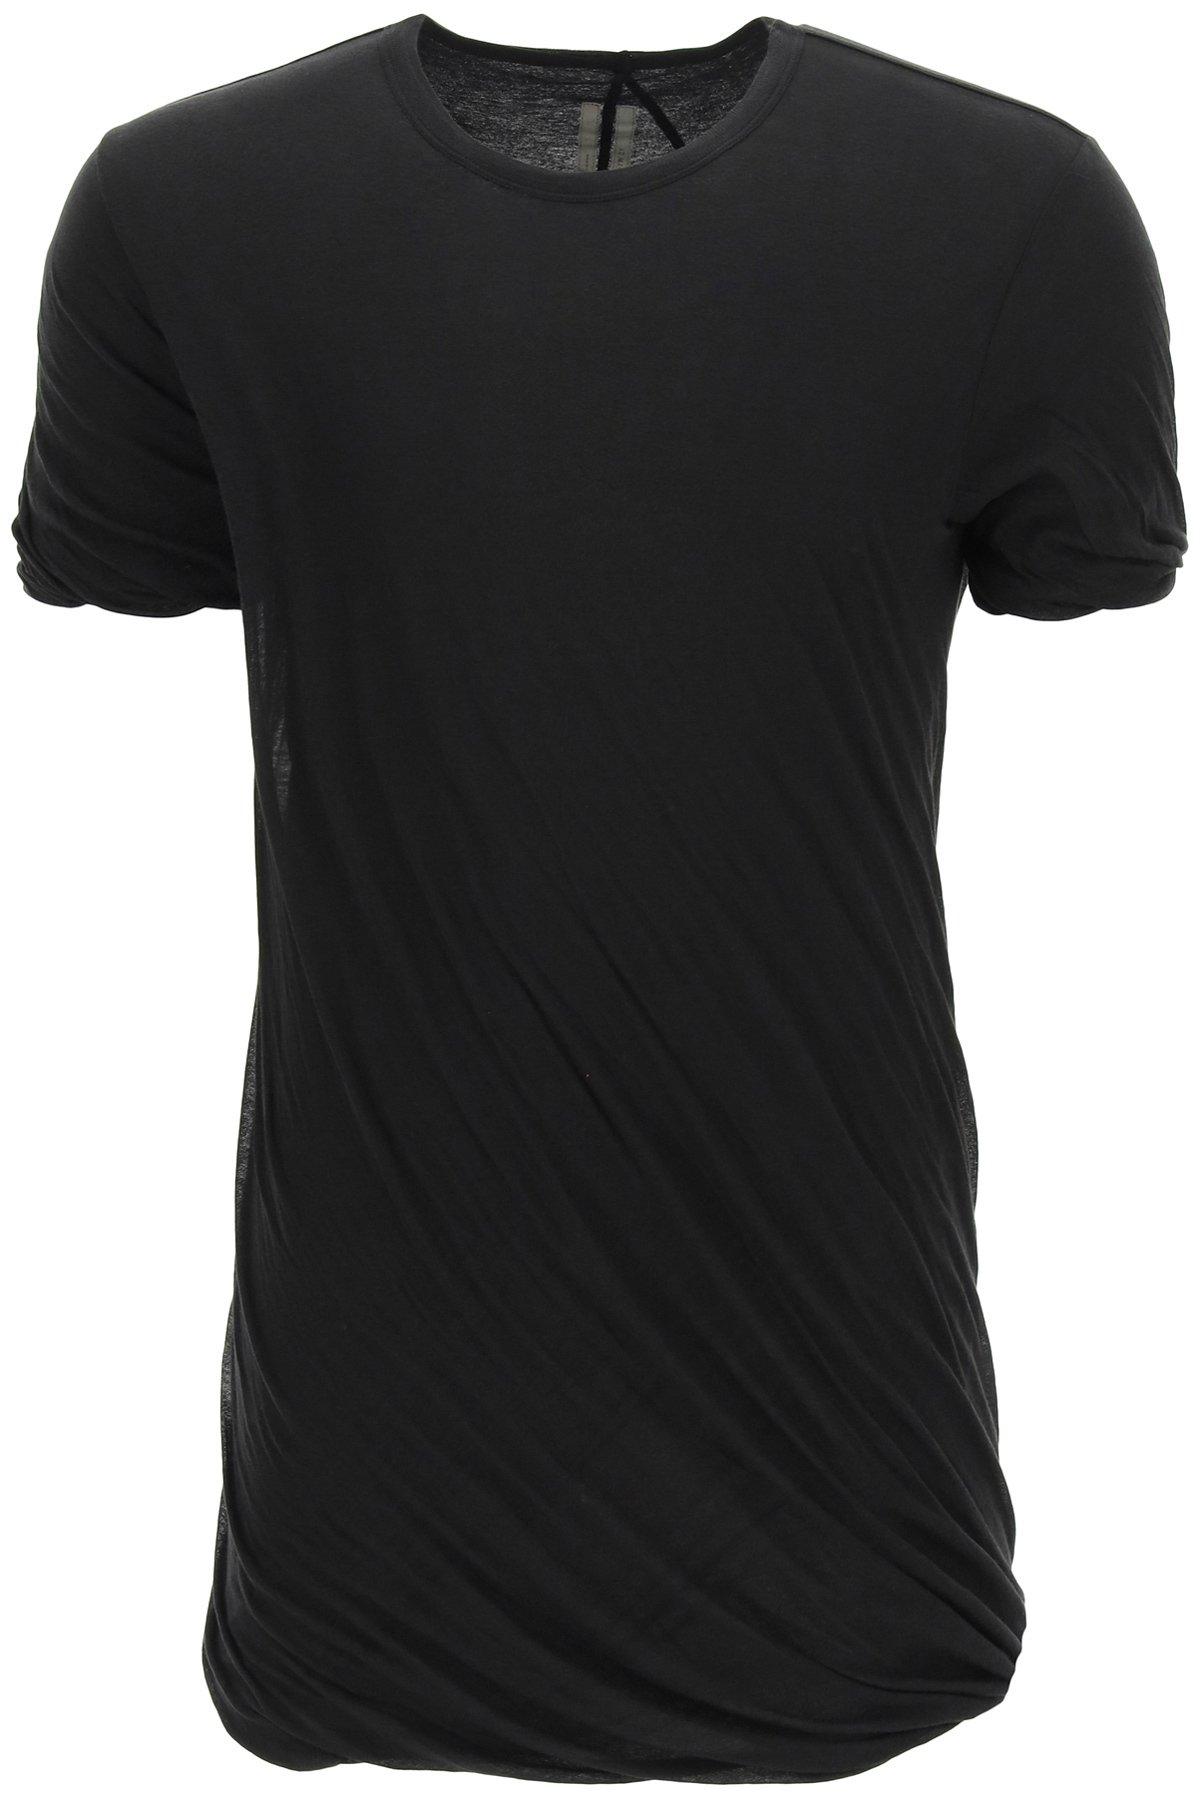 Rick owens t-shirt arricciata gethsemane